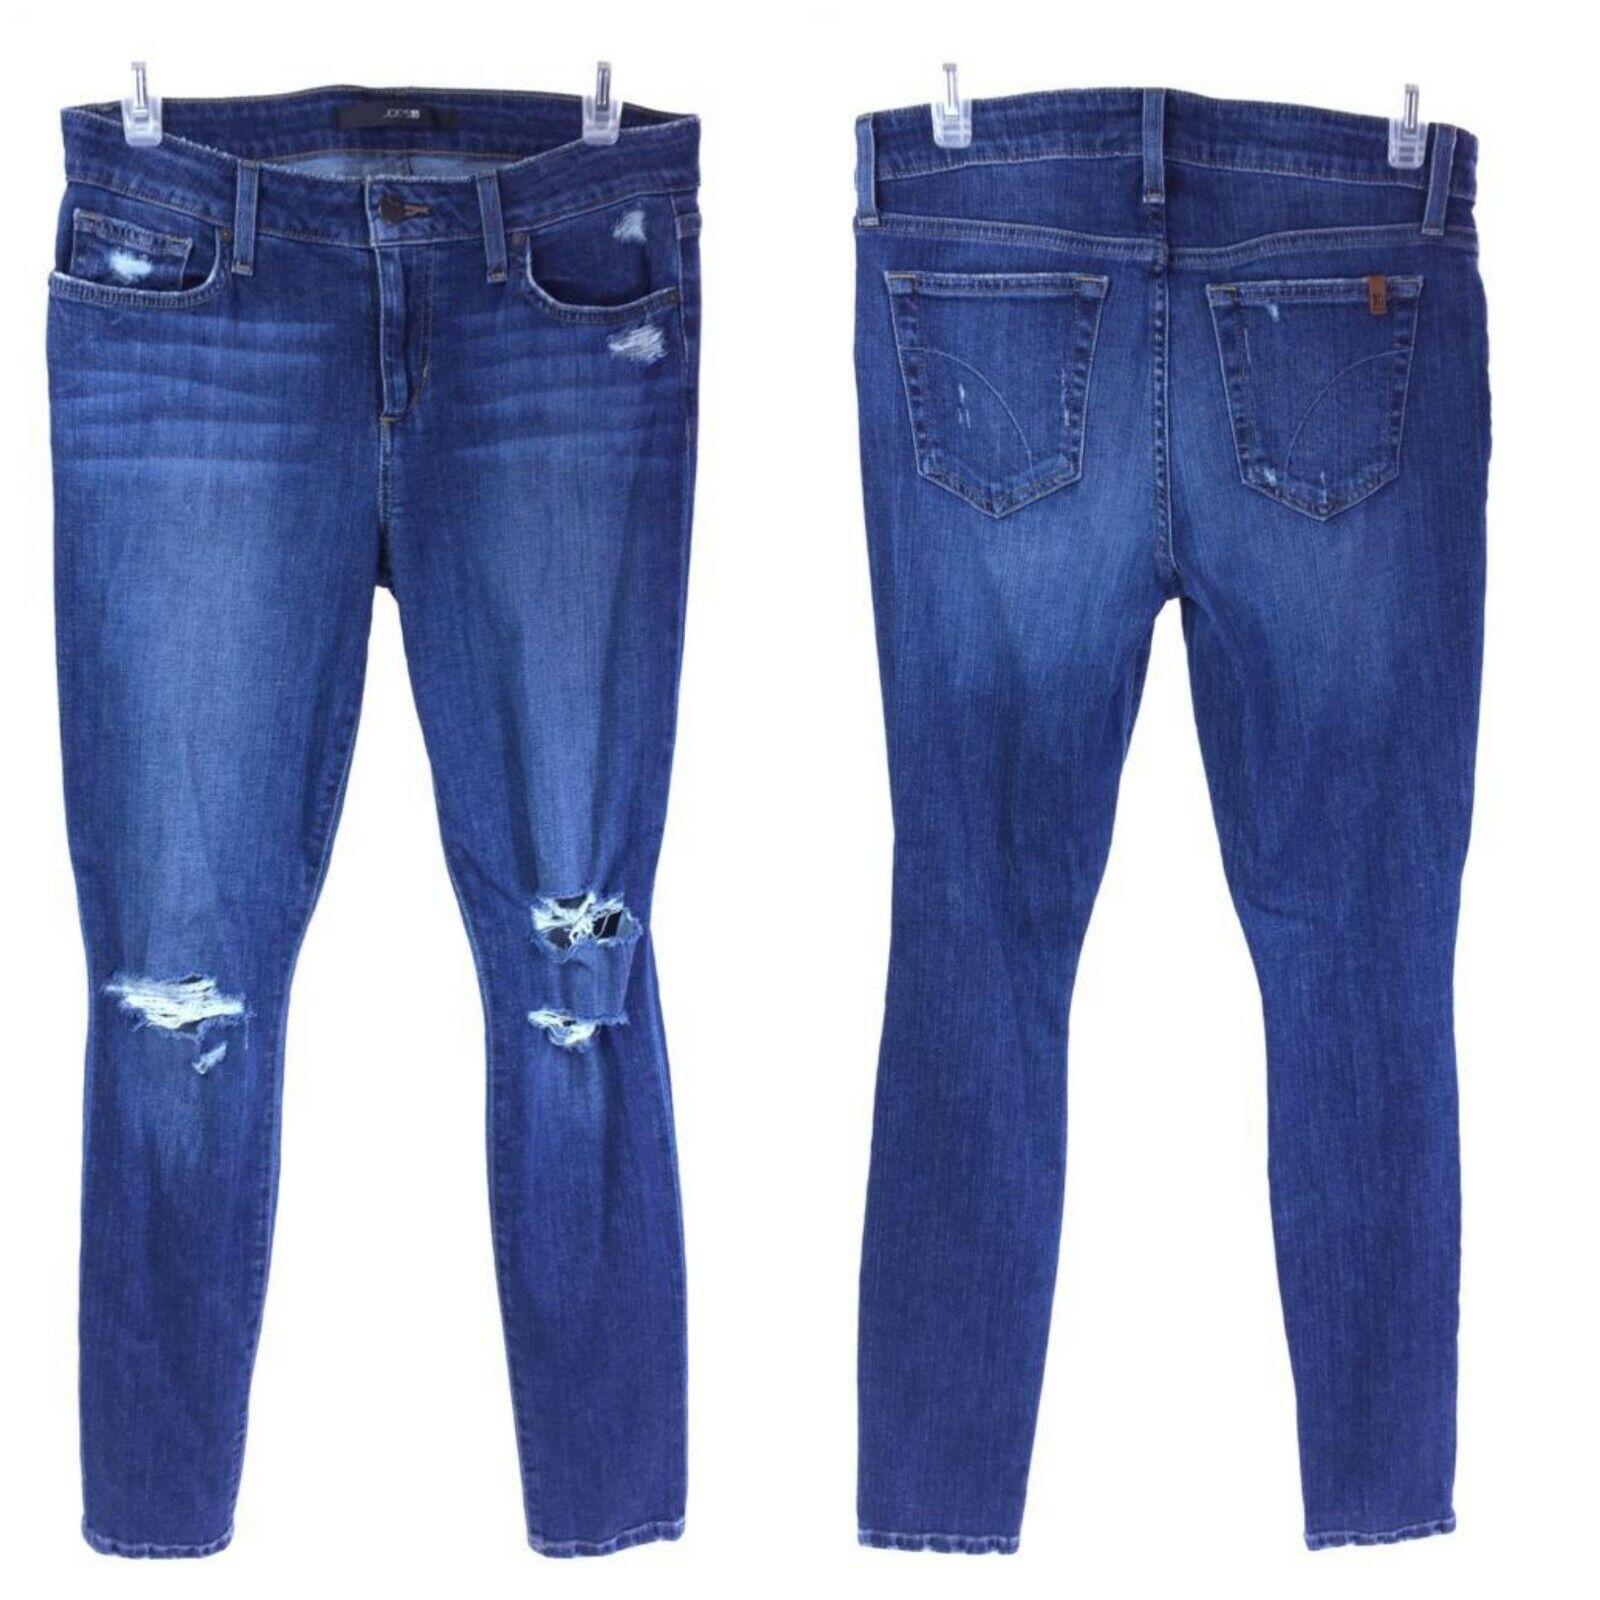 Marc cain essentials coated skinny jeans schwarz damen